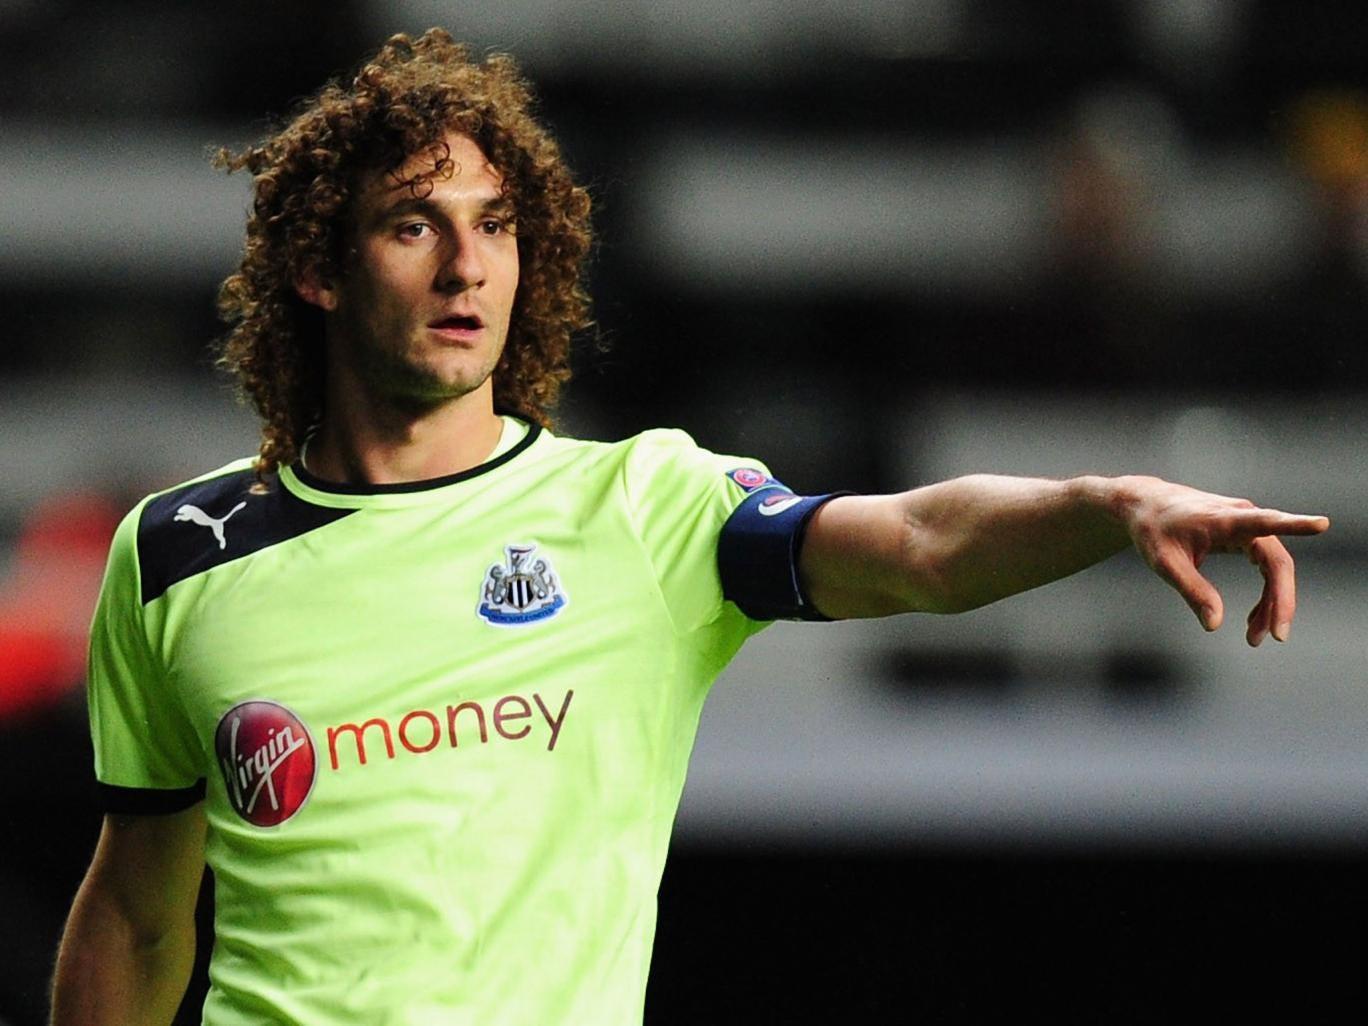 Newcastle captain Fabricio Coloccini wants to leave St James' Park